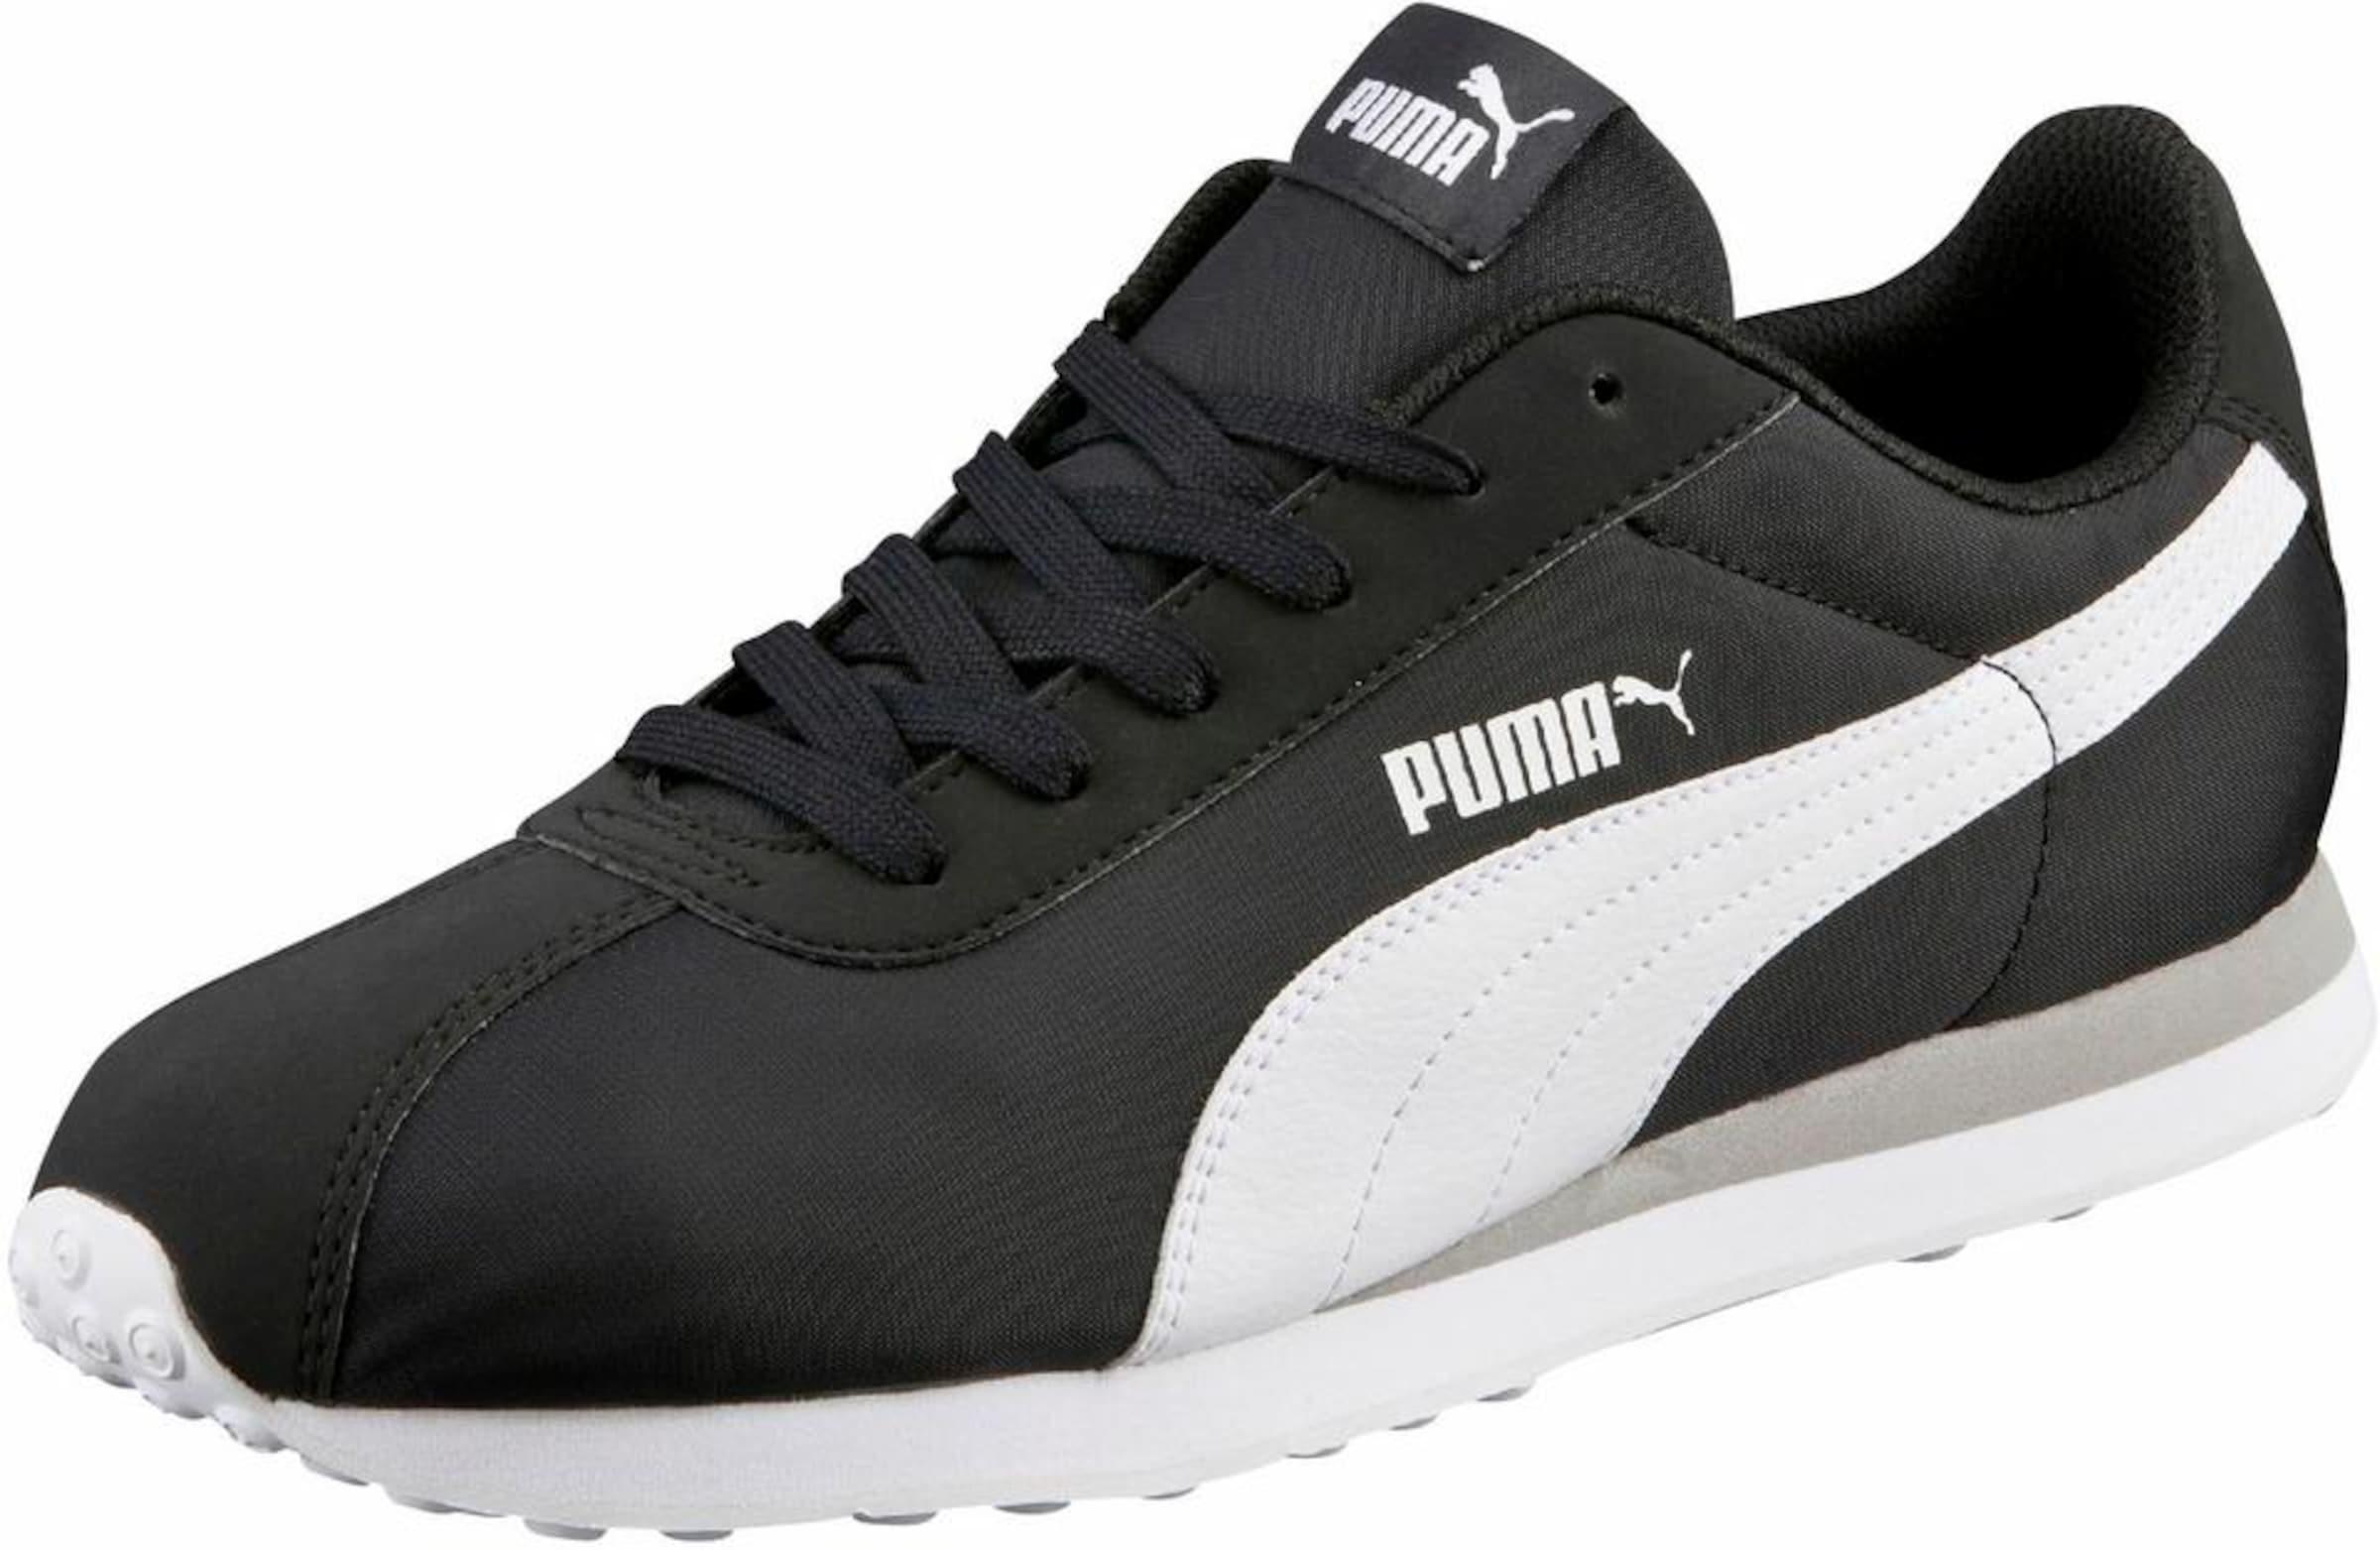 PUMA Sneaker  Turin NL